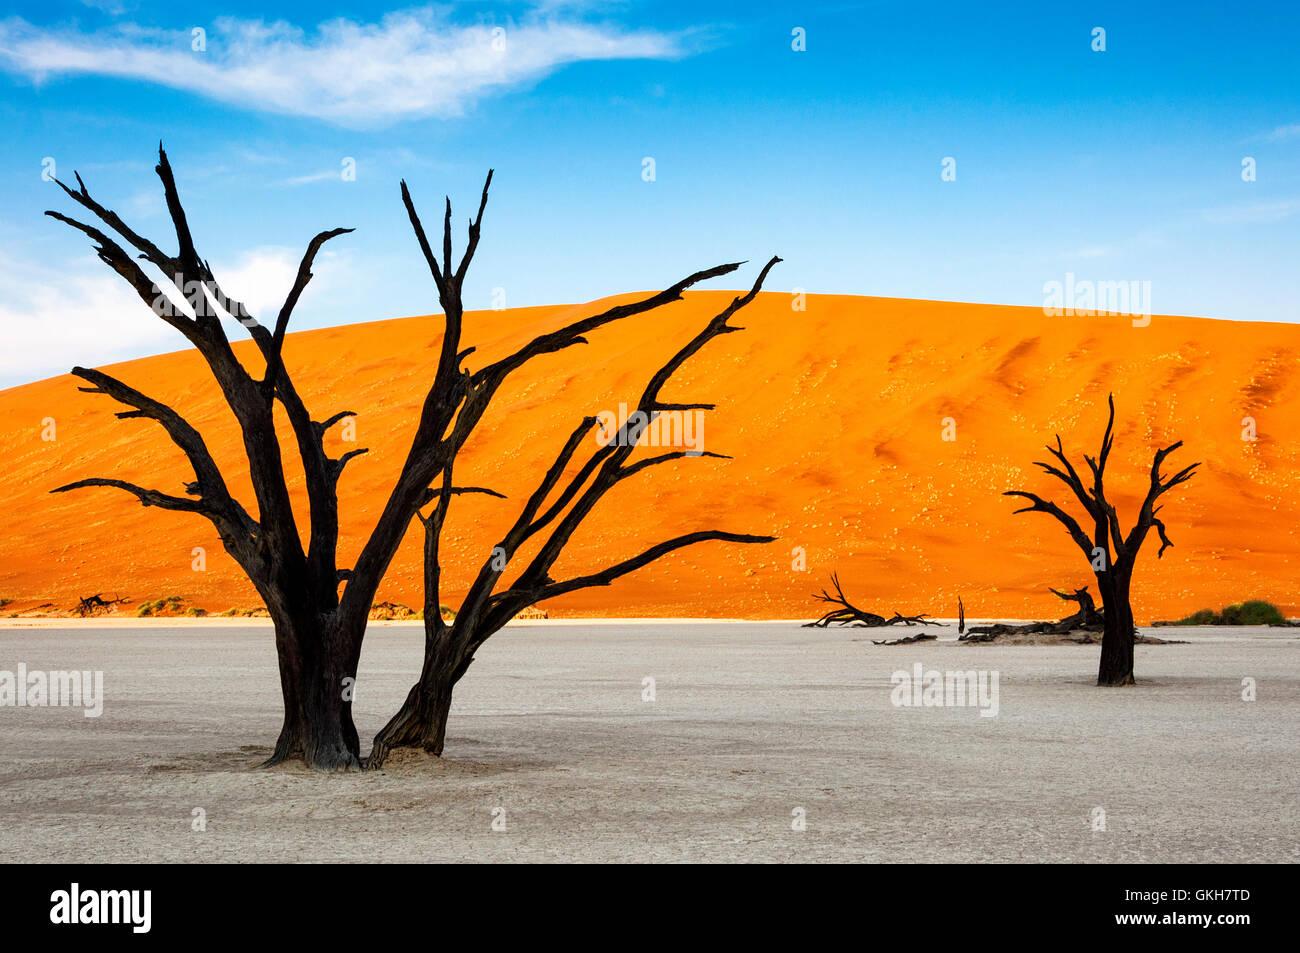 Bäume und roten Dünen im Dead Vlei, Sossuslvei, Namibia; Konzept für Reisen in Afrika Stockbild